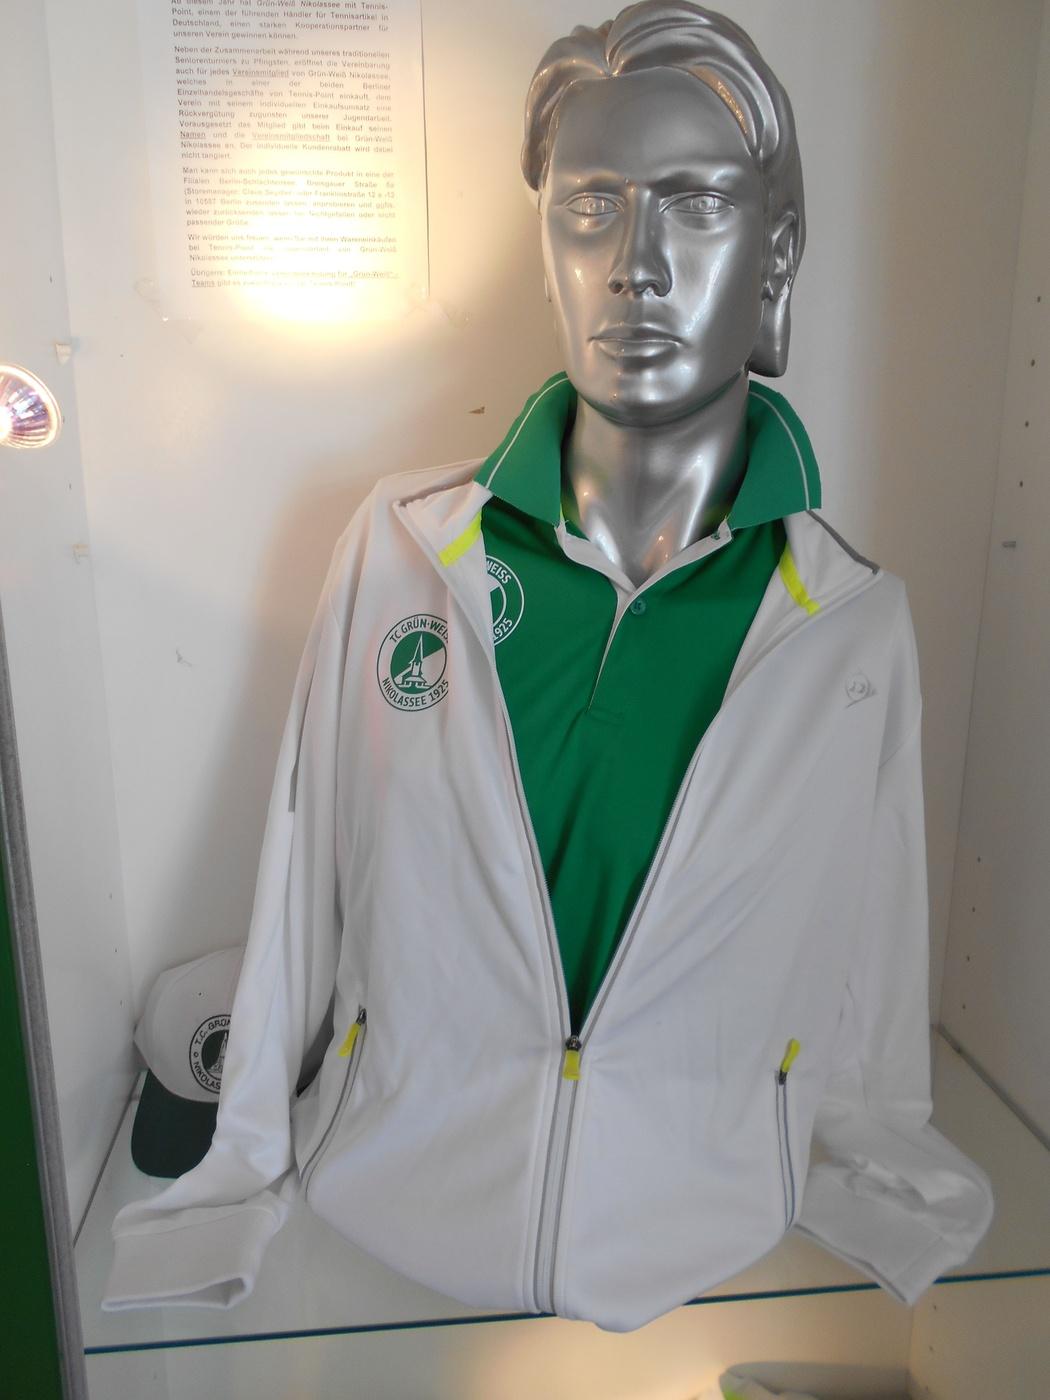 Dunlop Trainingsjacke und Polo